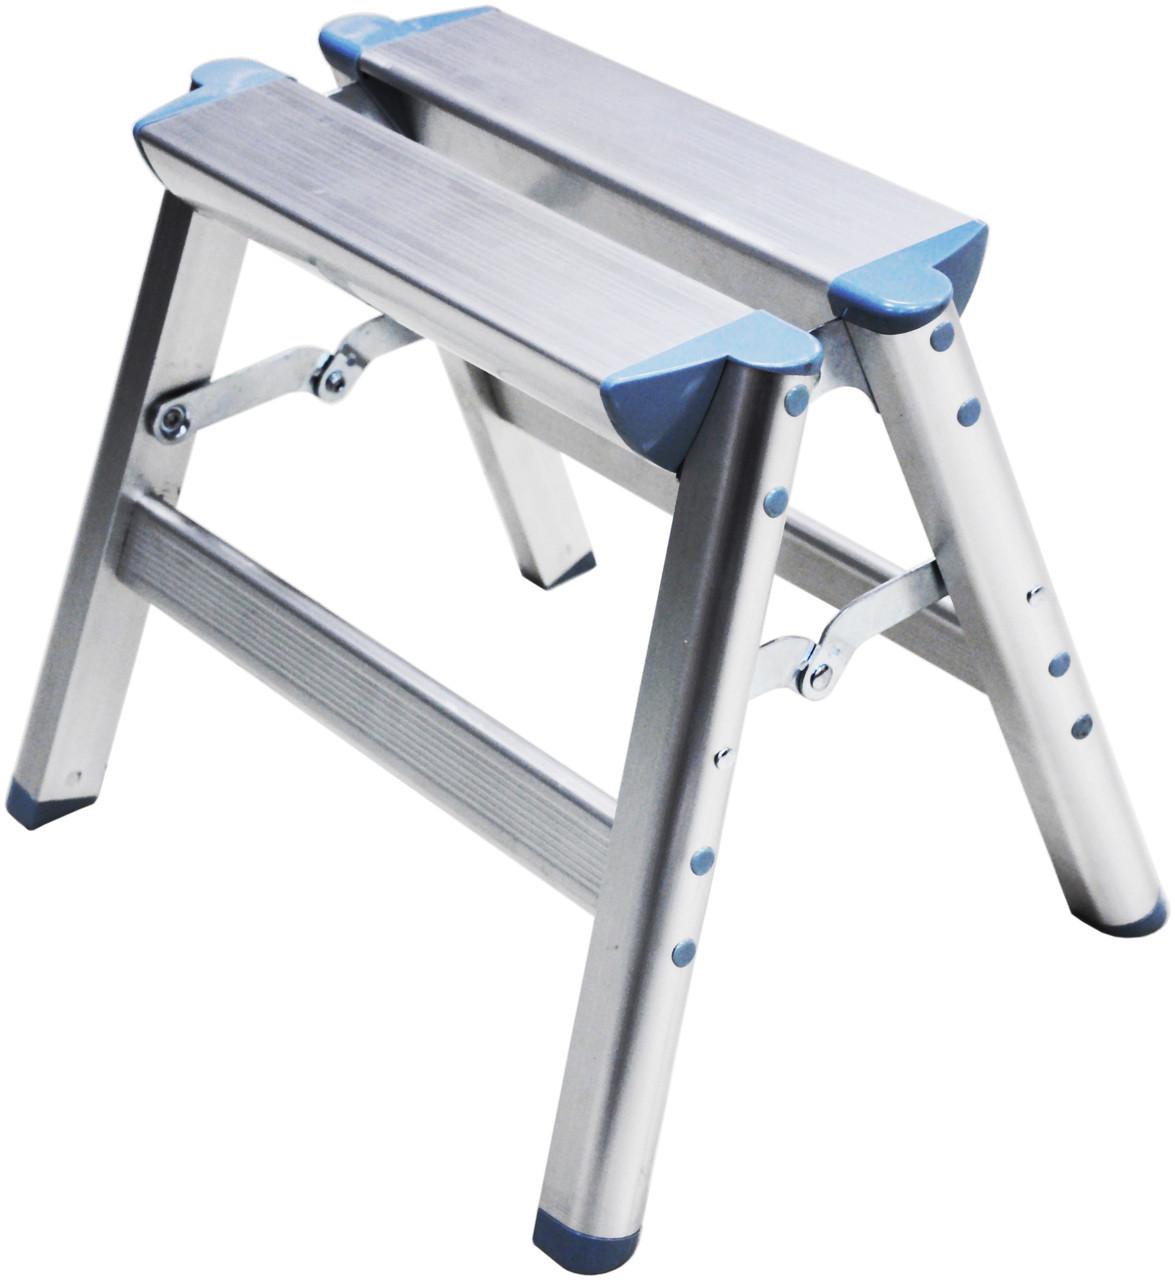 Telesteps 100ss 12 Quot Aluminum Folding Step Stool Free